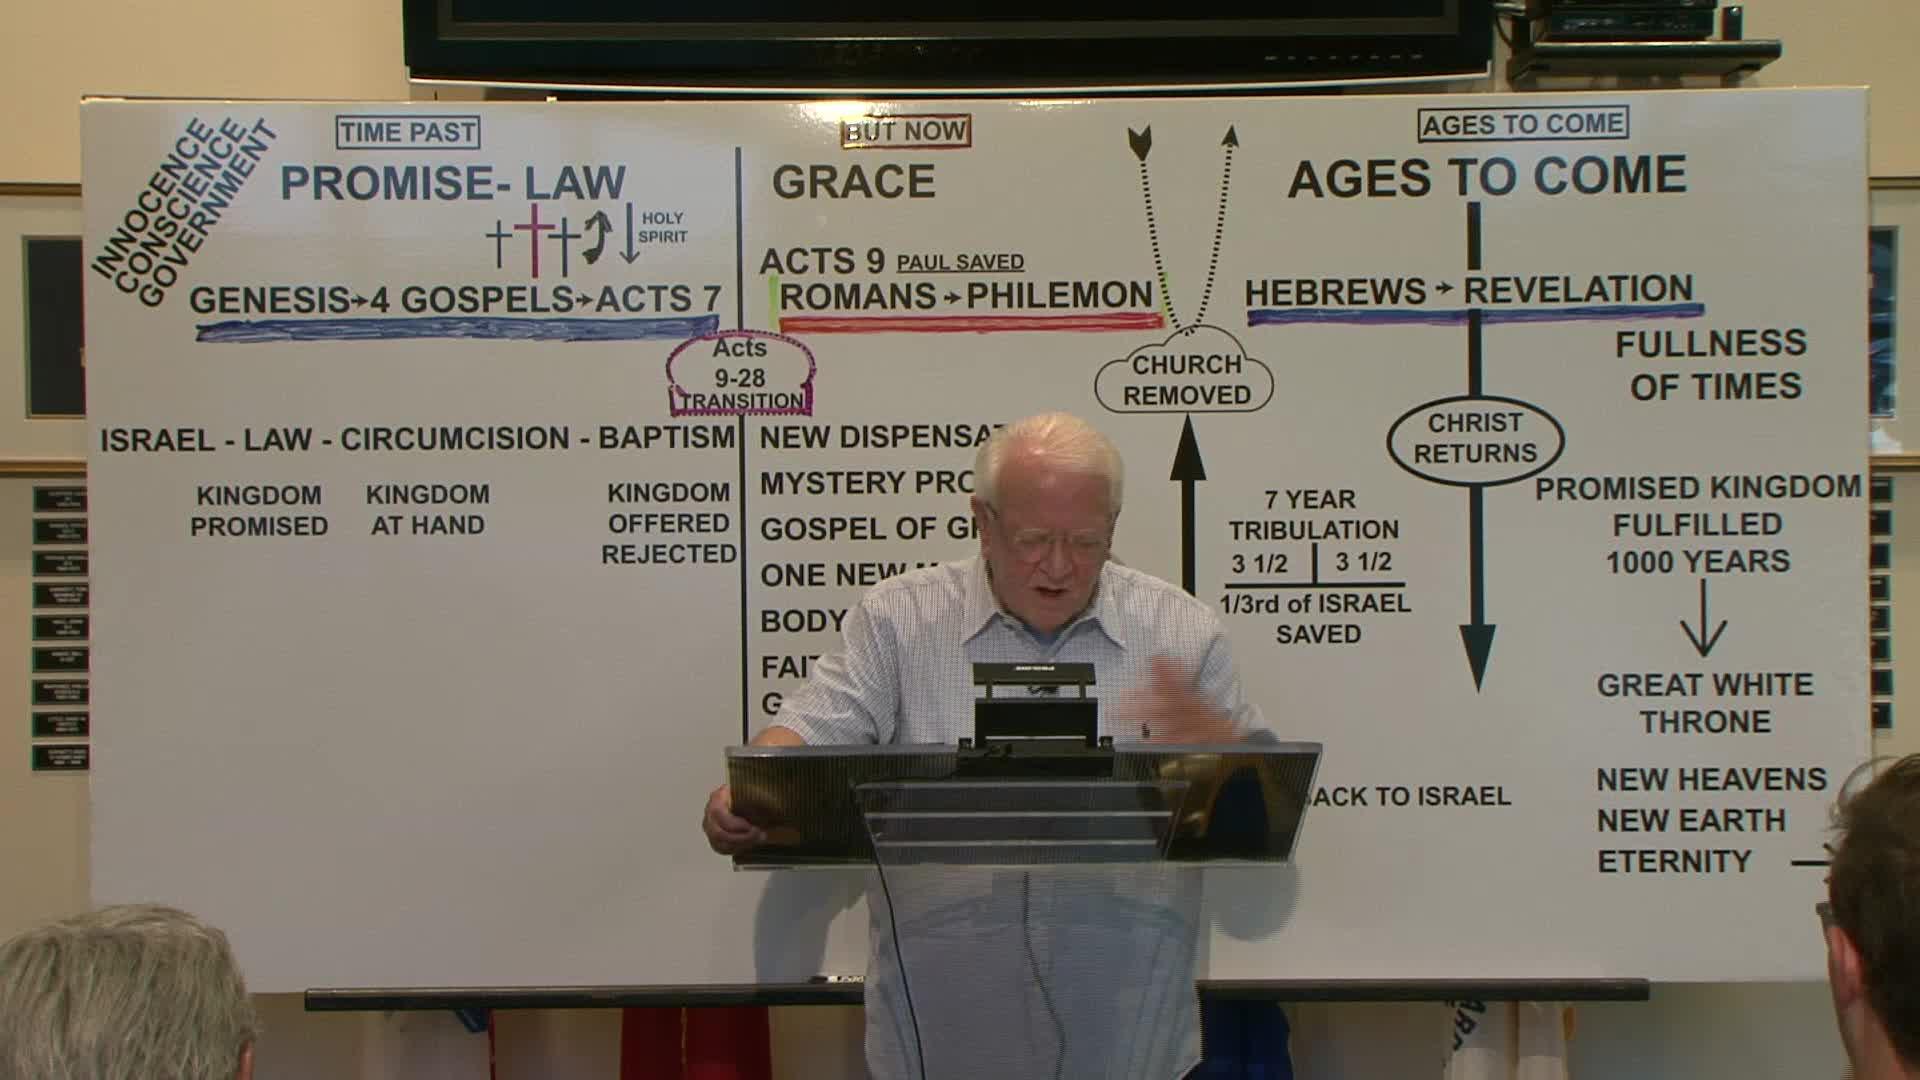 Revelation 1: 1-11